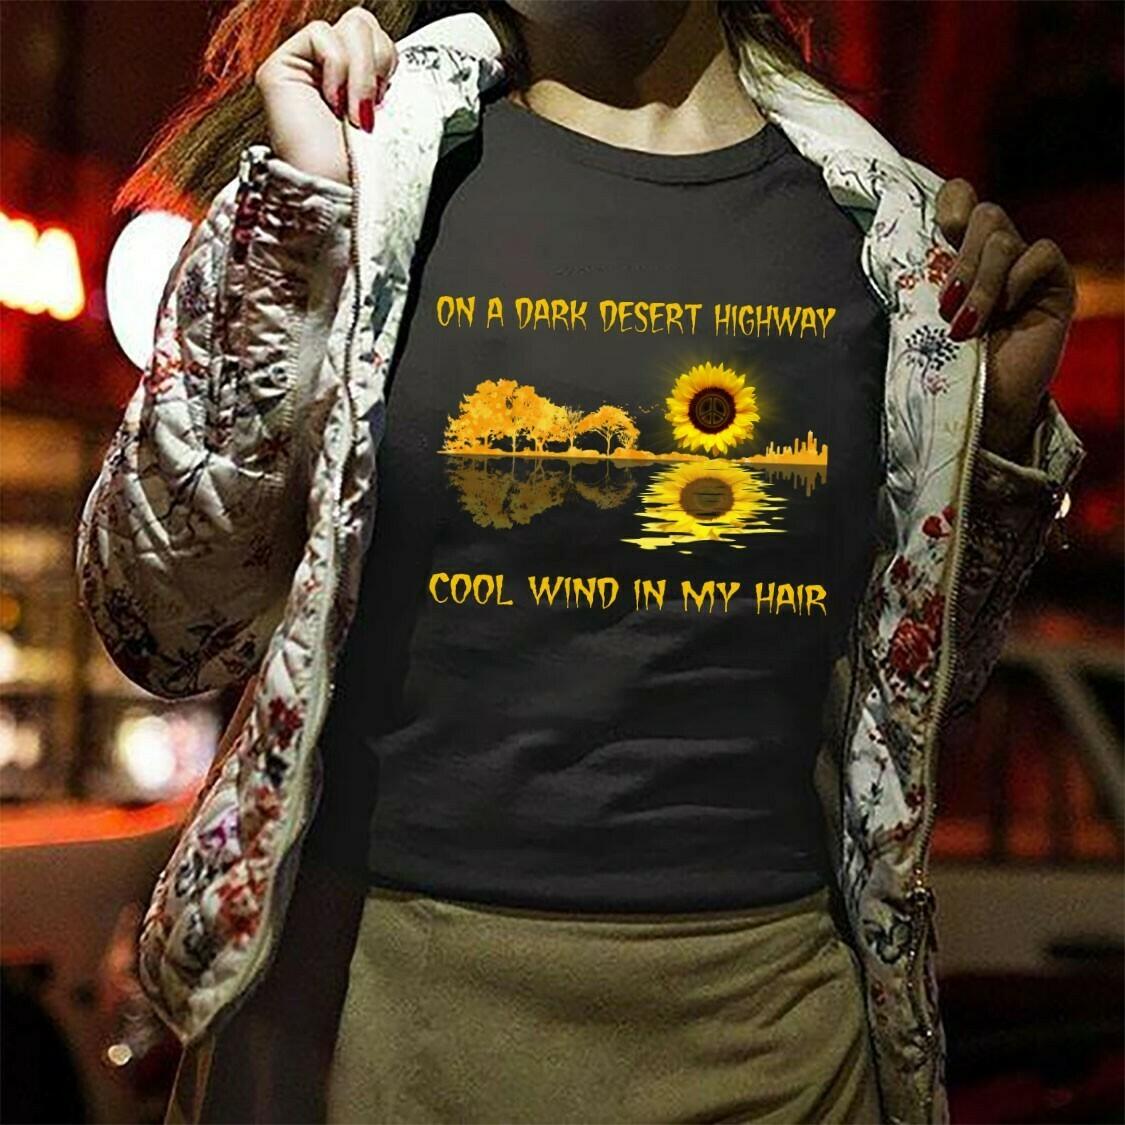 Sunflower Guitar Lake Shadow On A Dark Desert Highway Cool Wind In My Hair Bad Girls In The Moonlight Gifts For Love Grandmalife Mom T-shirt Long Sleeve Sweatshirt Hoodie Jolly Family Gifts